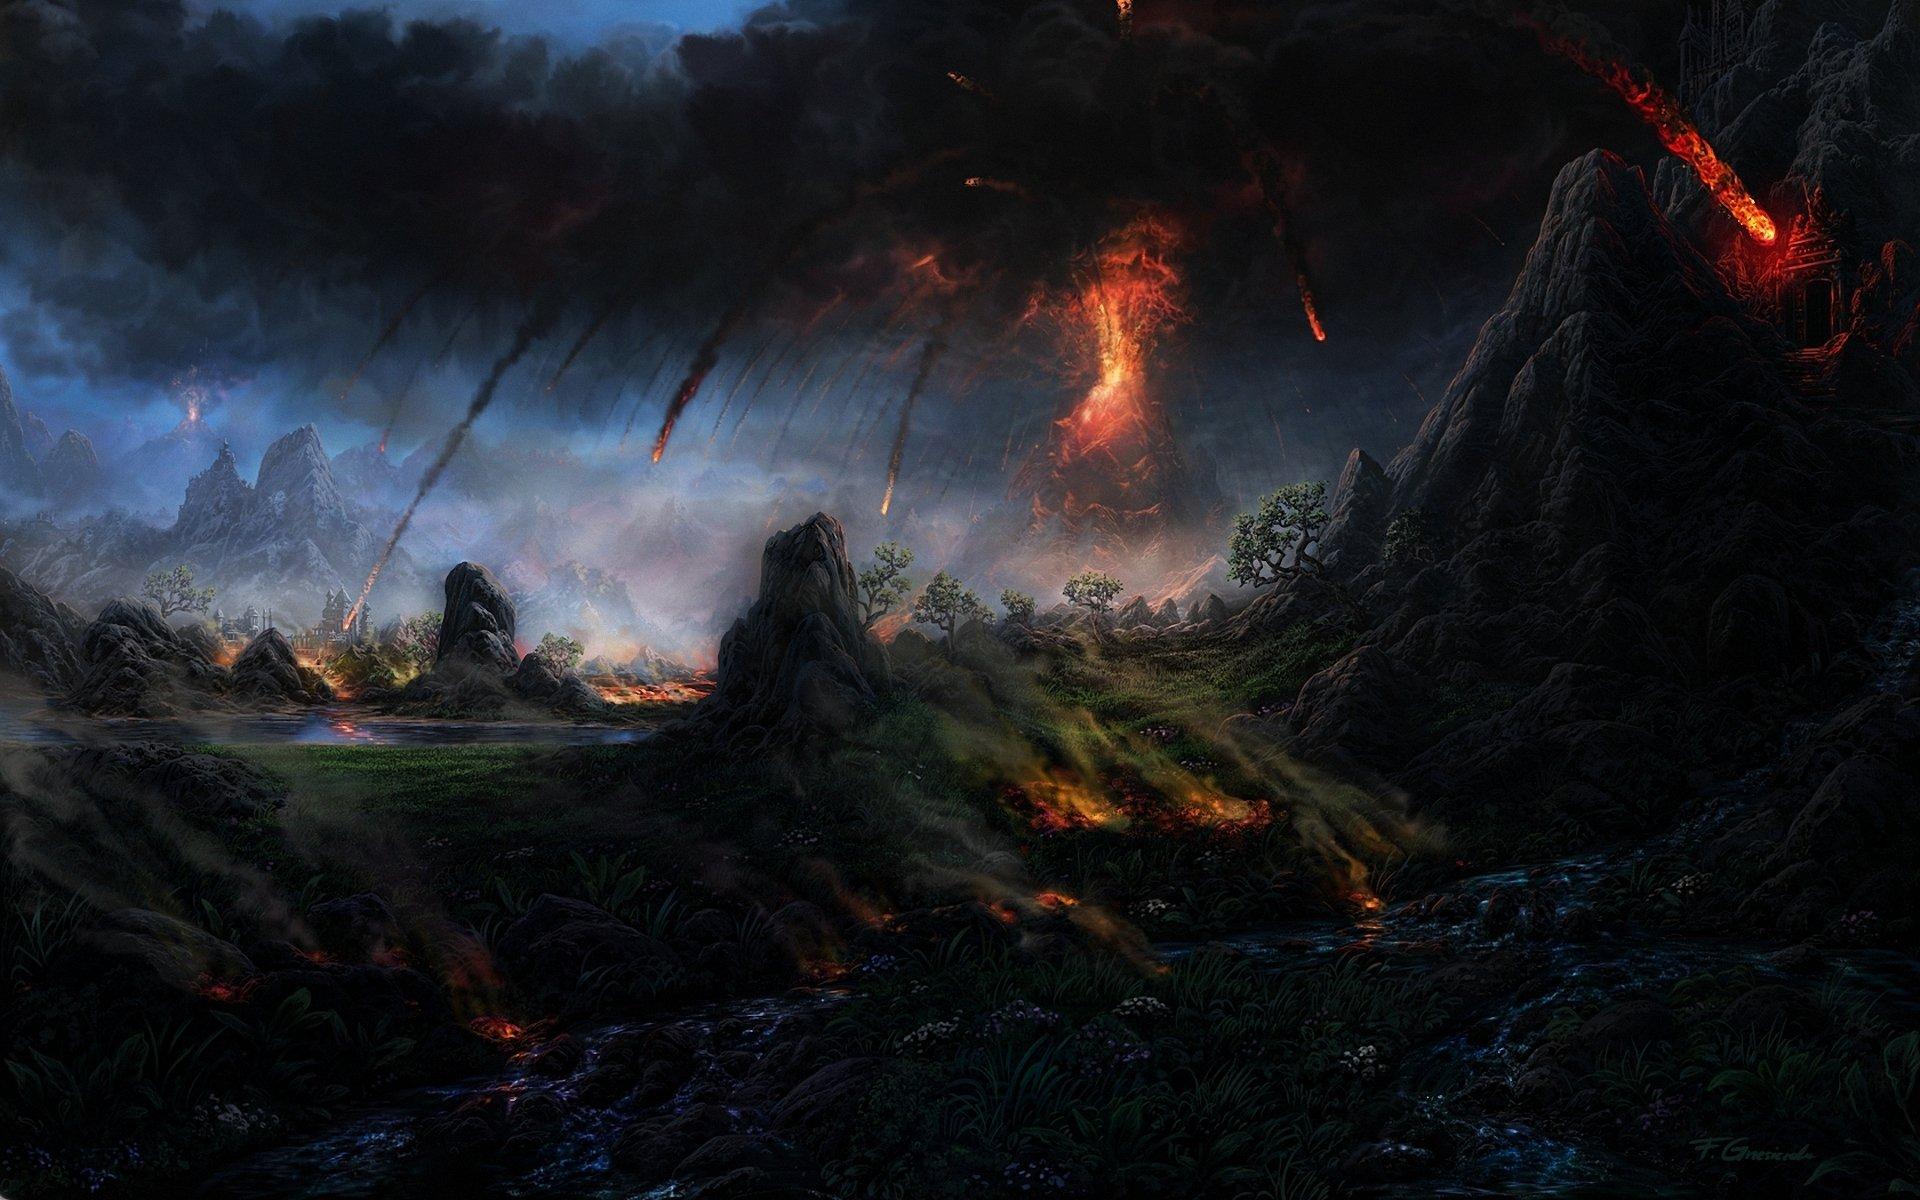 evil landscape background - photo #22